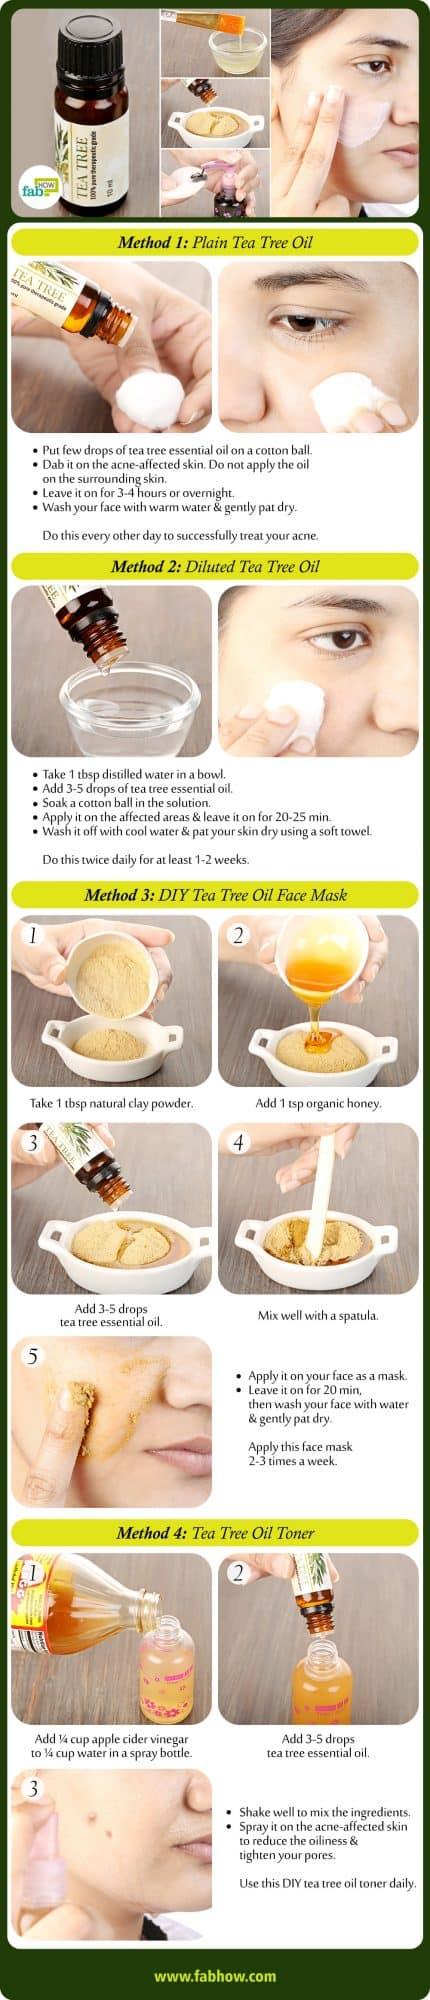 how to use tea tree oil for acne summary